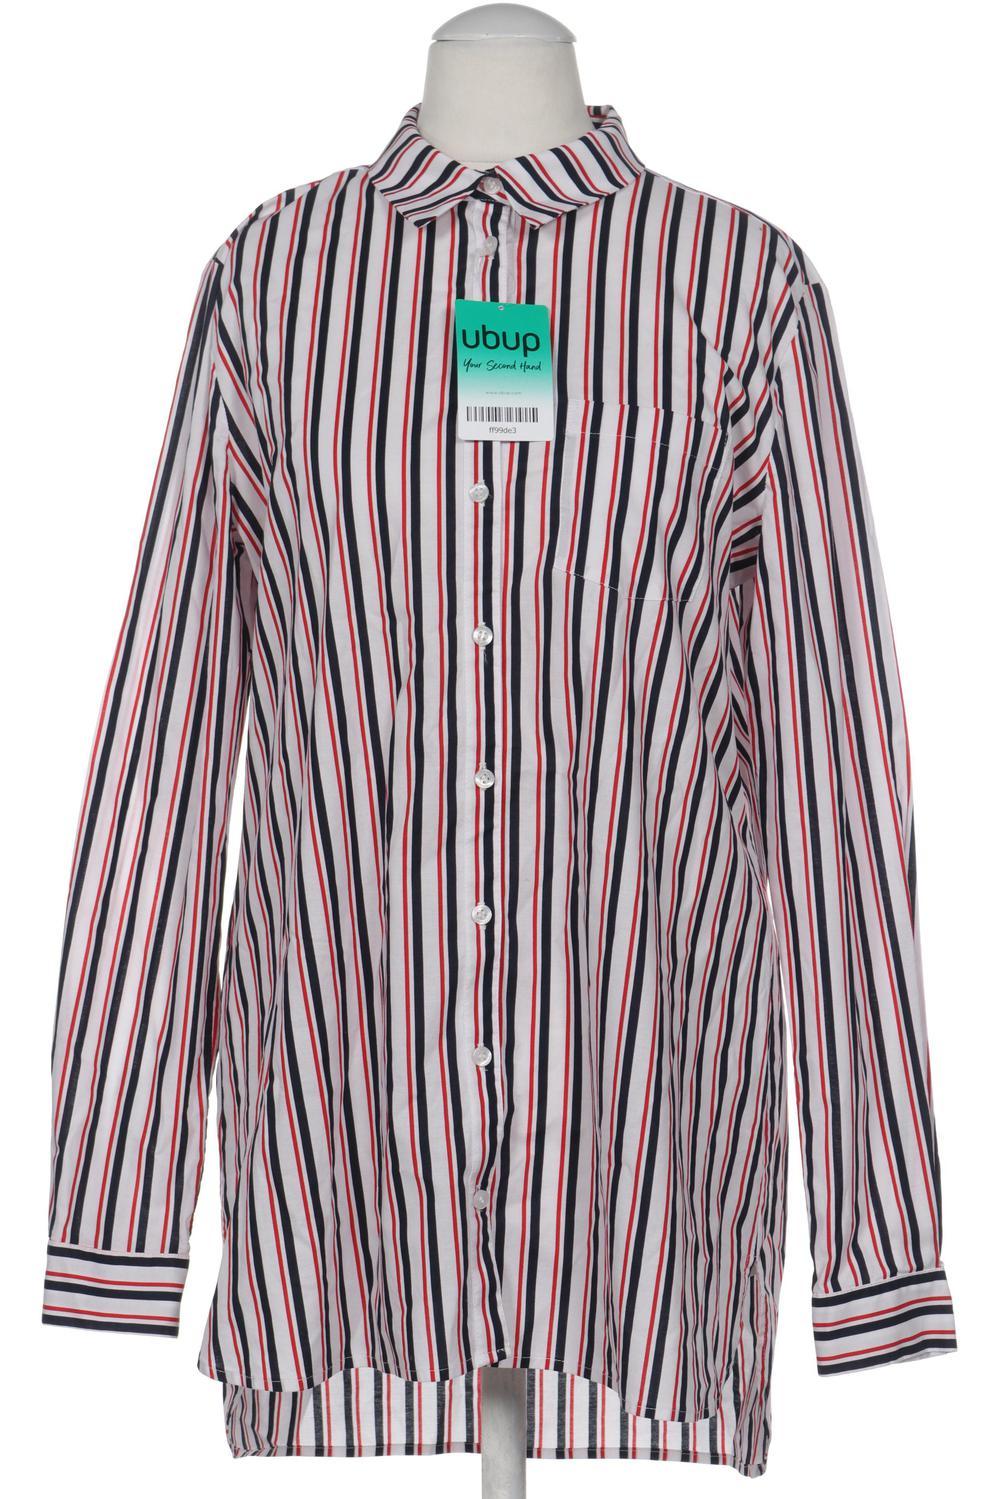 check out 318e7 f2564 ubup   Comma Damen Bluse DE 34 Second Hand kaufen